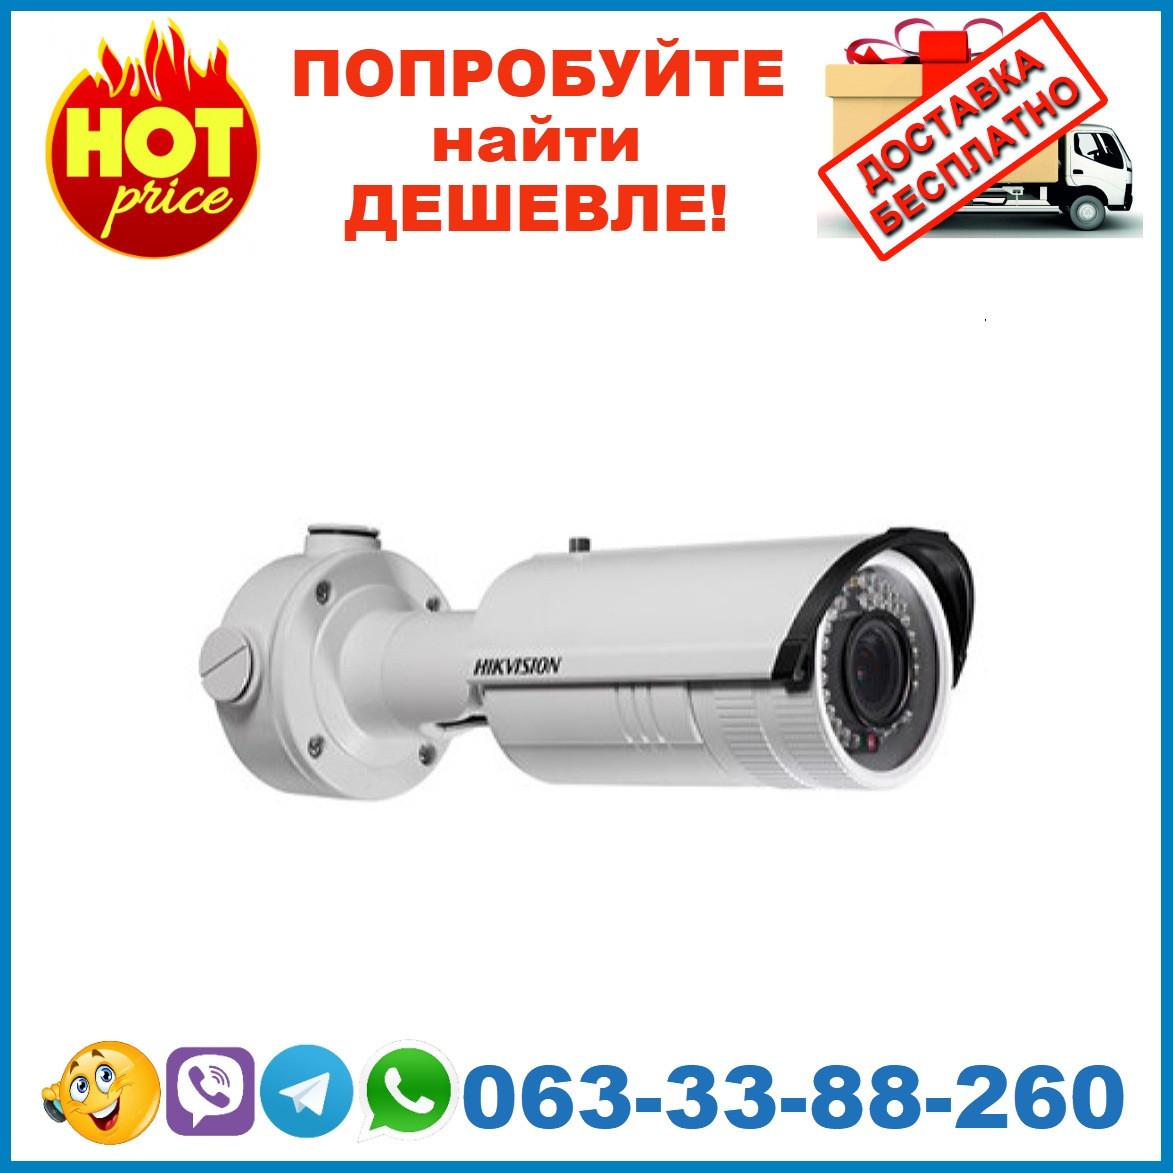 DS-2CD4212FWD-IZ  1.3МП IP видеокамера Hikvision с ИК подсветкой